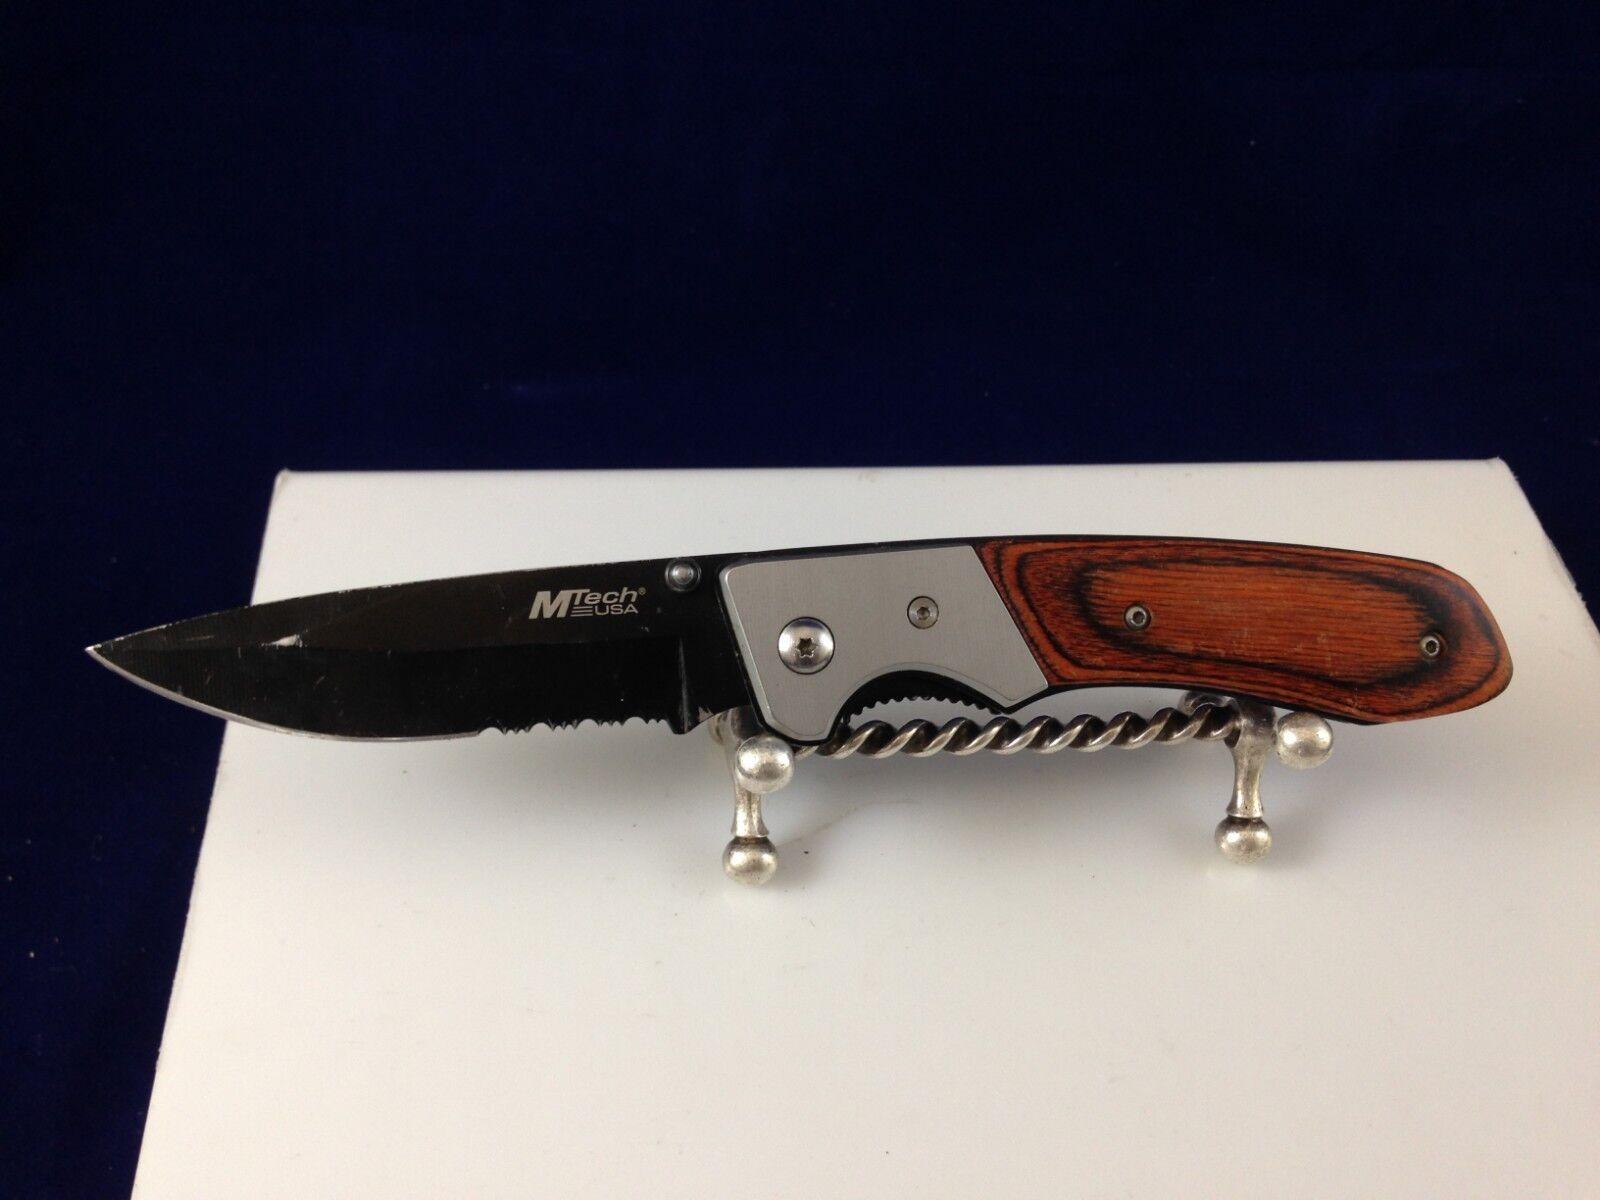 Mtech USA pocket knife 440 steel USA design nice wood handle w/ bolster linerlck